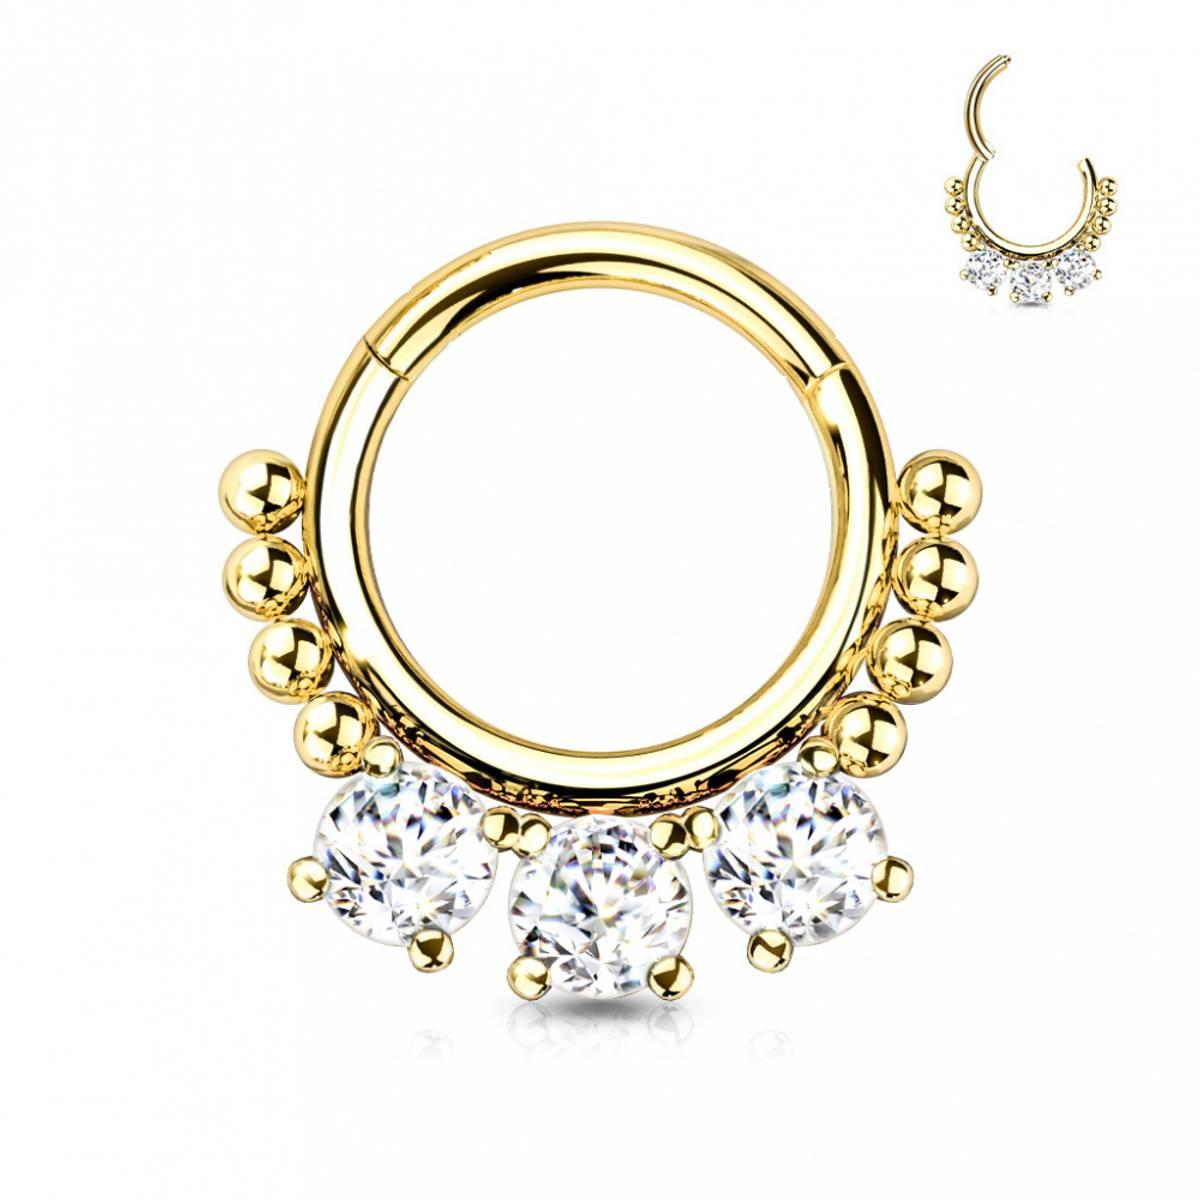 Jane Front Facing Hinged Ring Gold